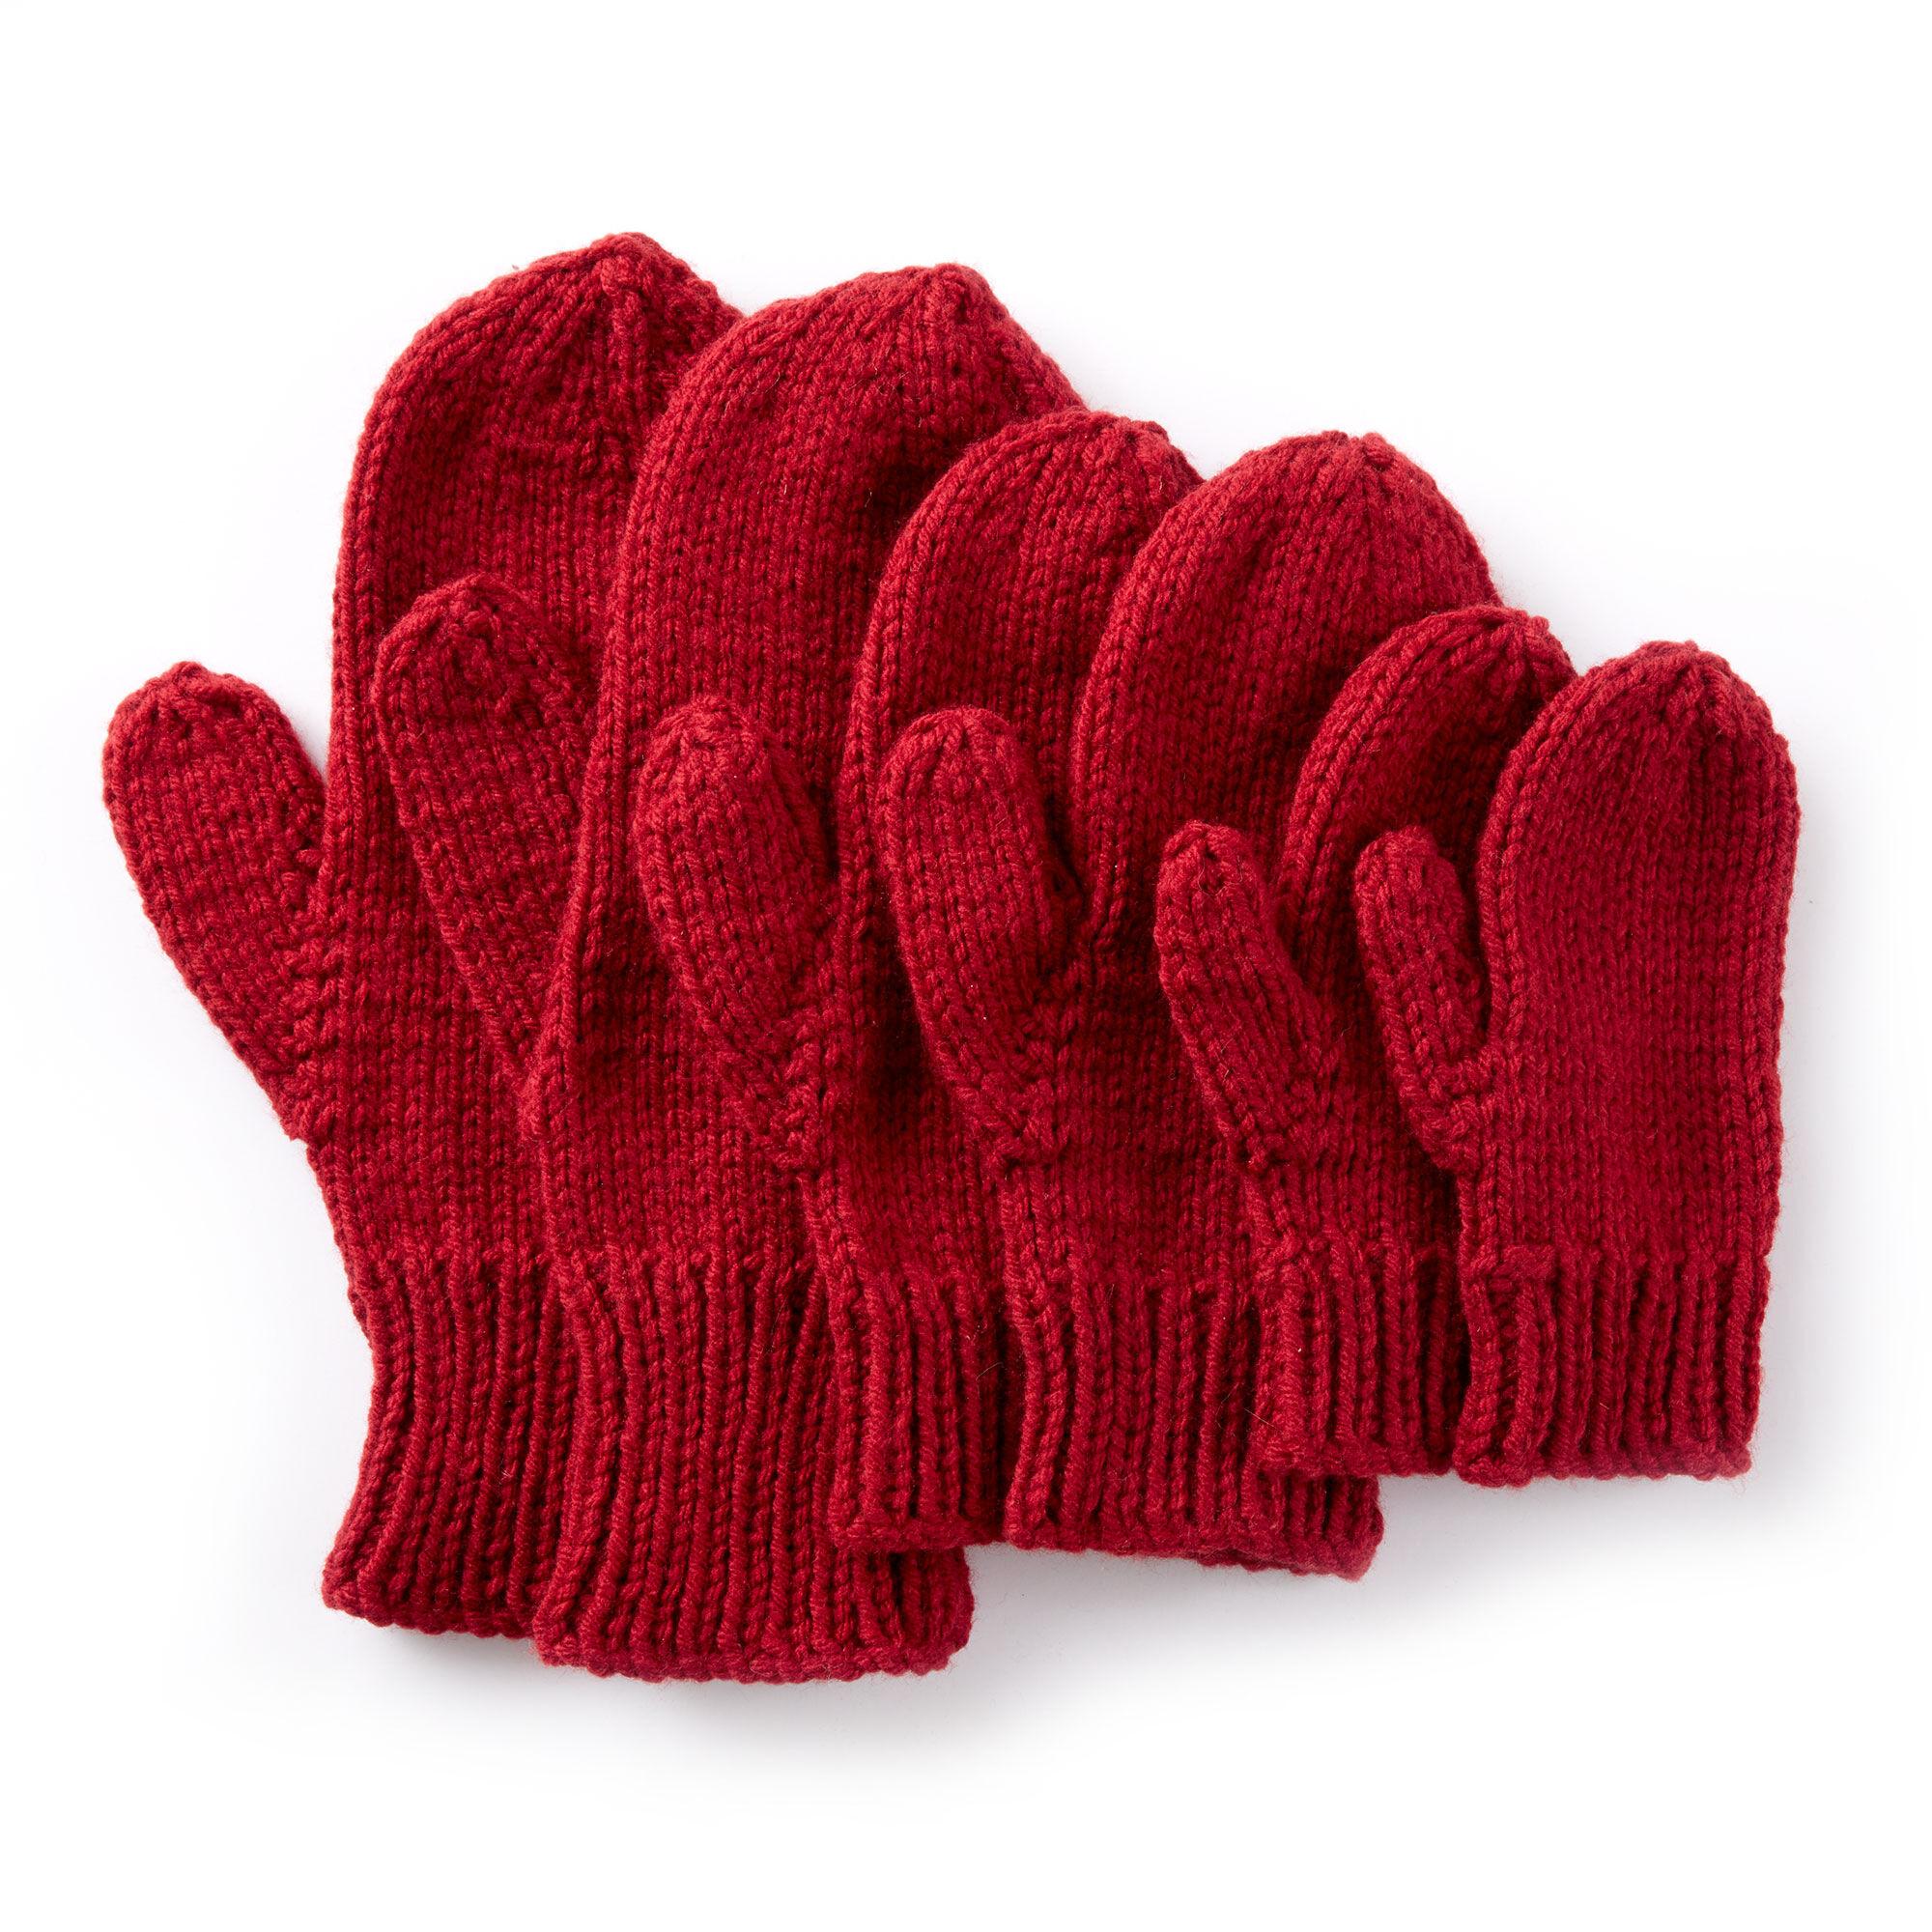 Caron Basic Family Knit Mittens | Yarnspirations